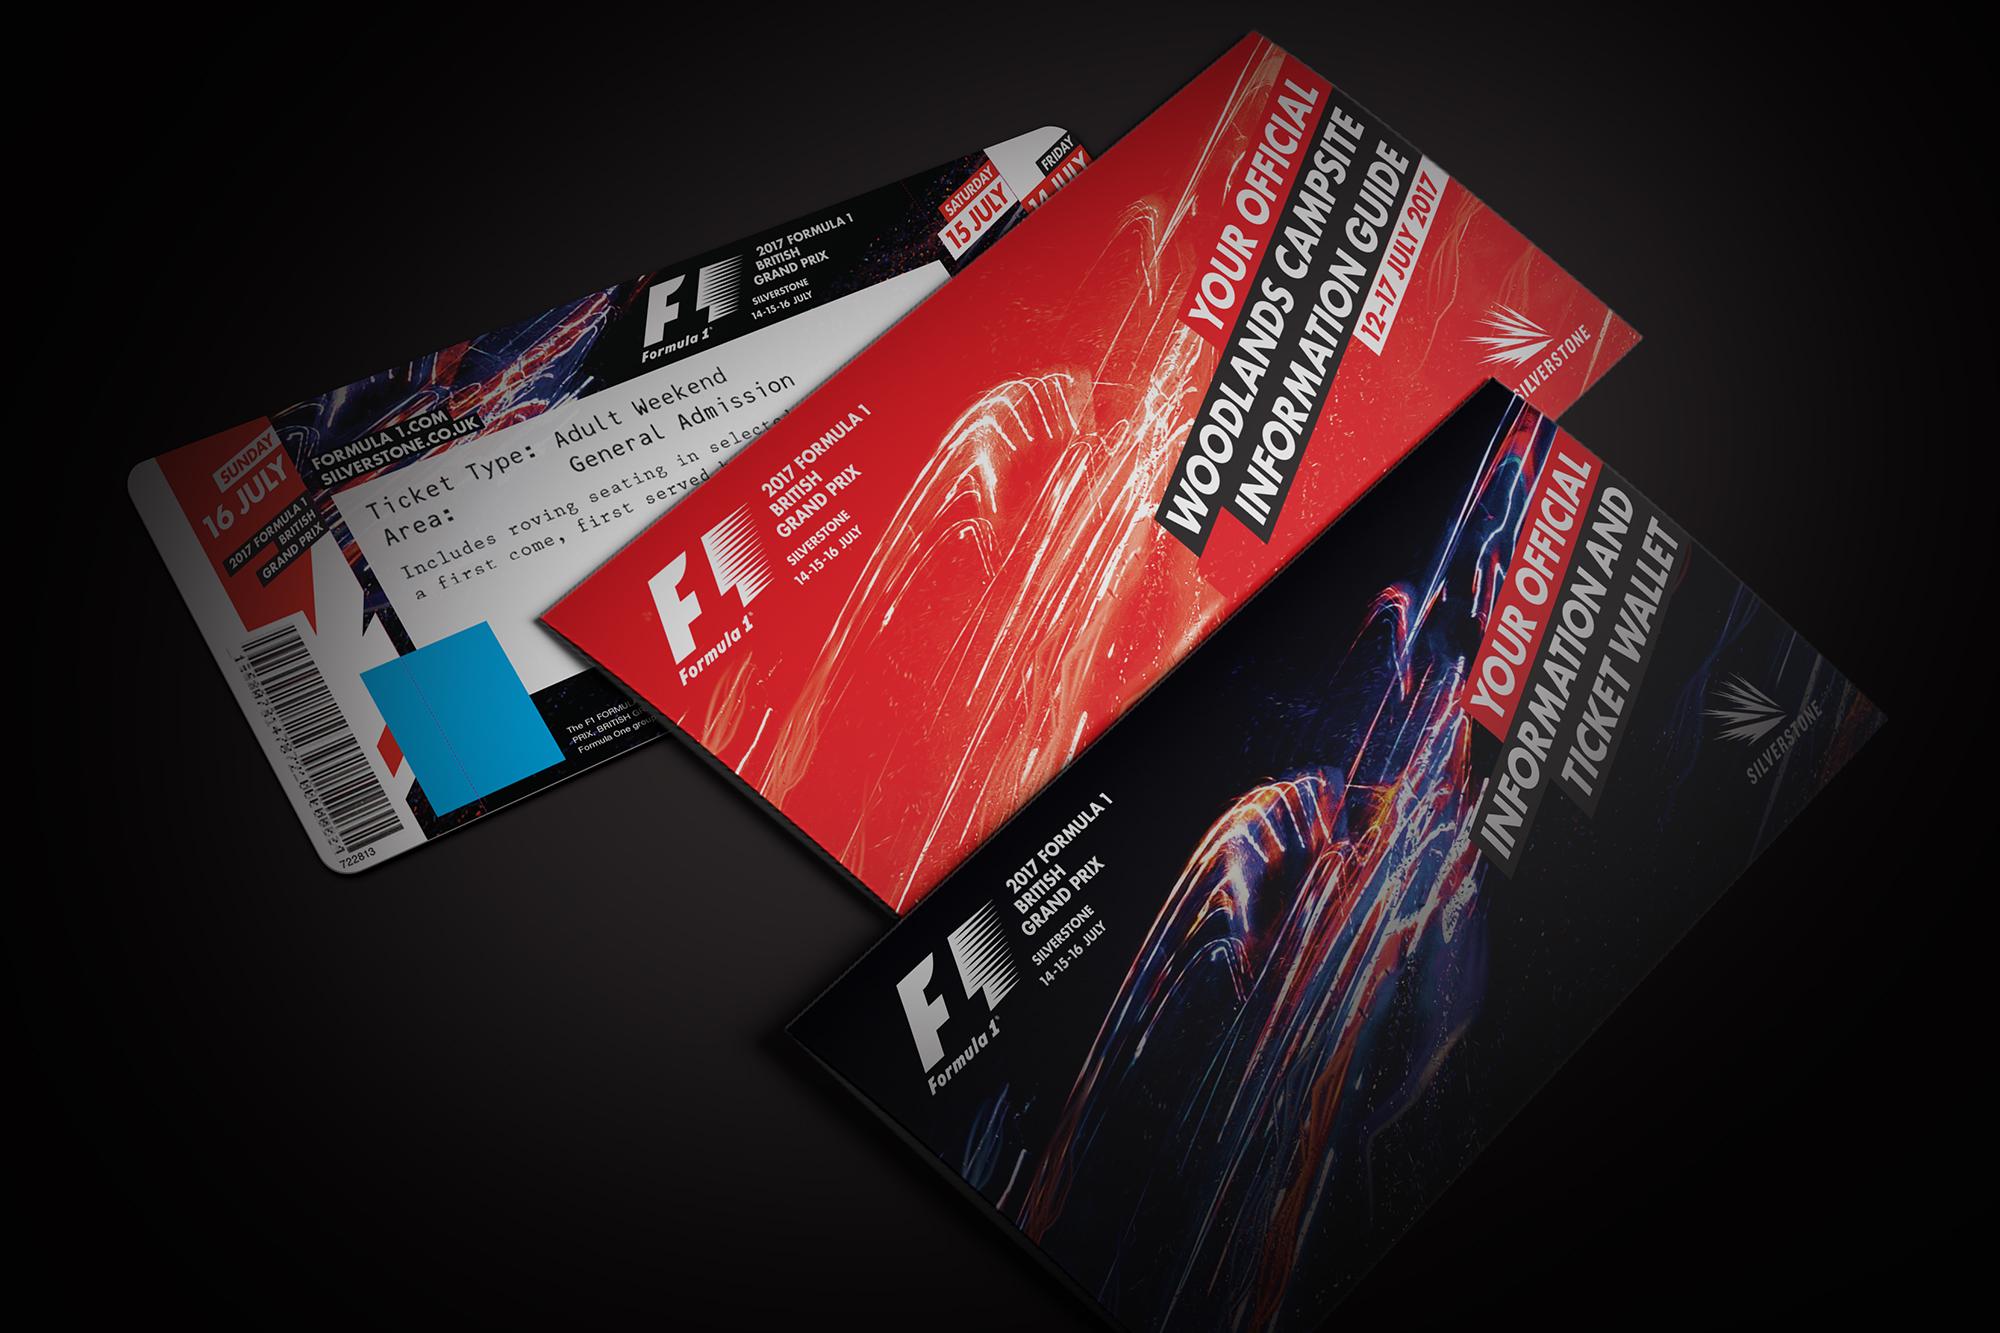 Silverstone_F1_2017_CaseStudies_IMAGES_2.jpg